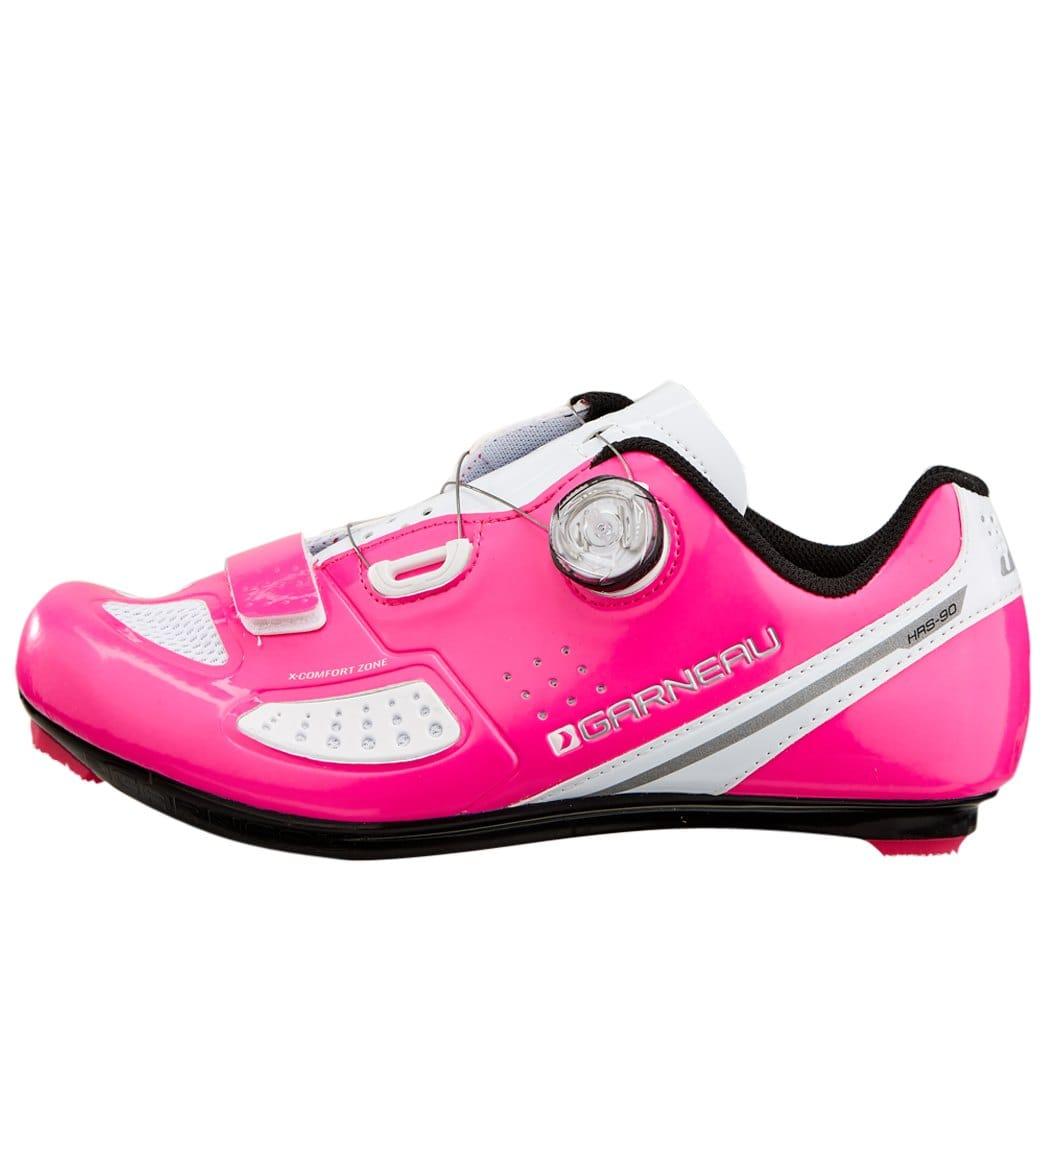 Louis Garneau Ruby II Shoes FNR4eWO0X